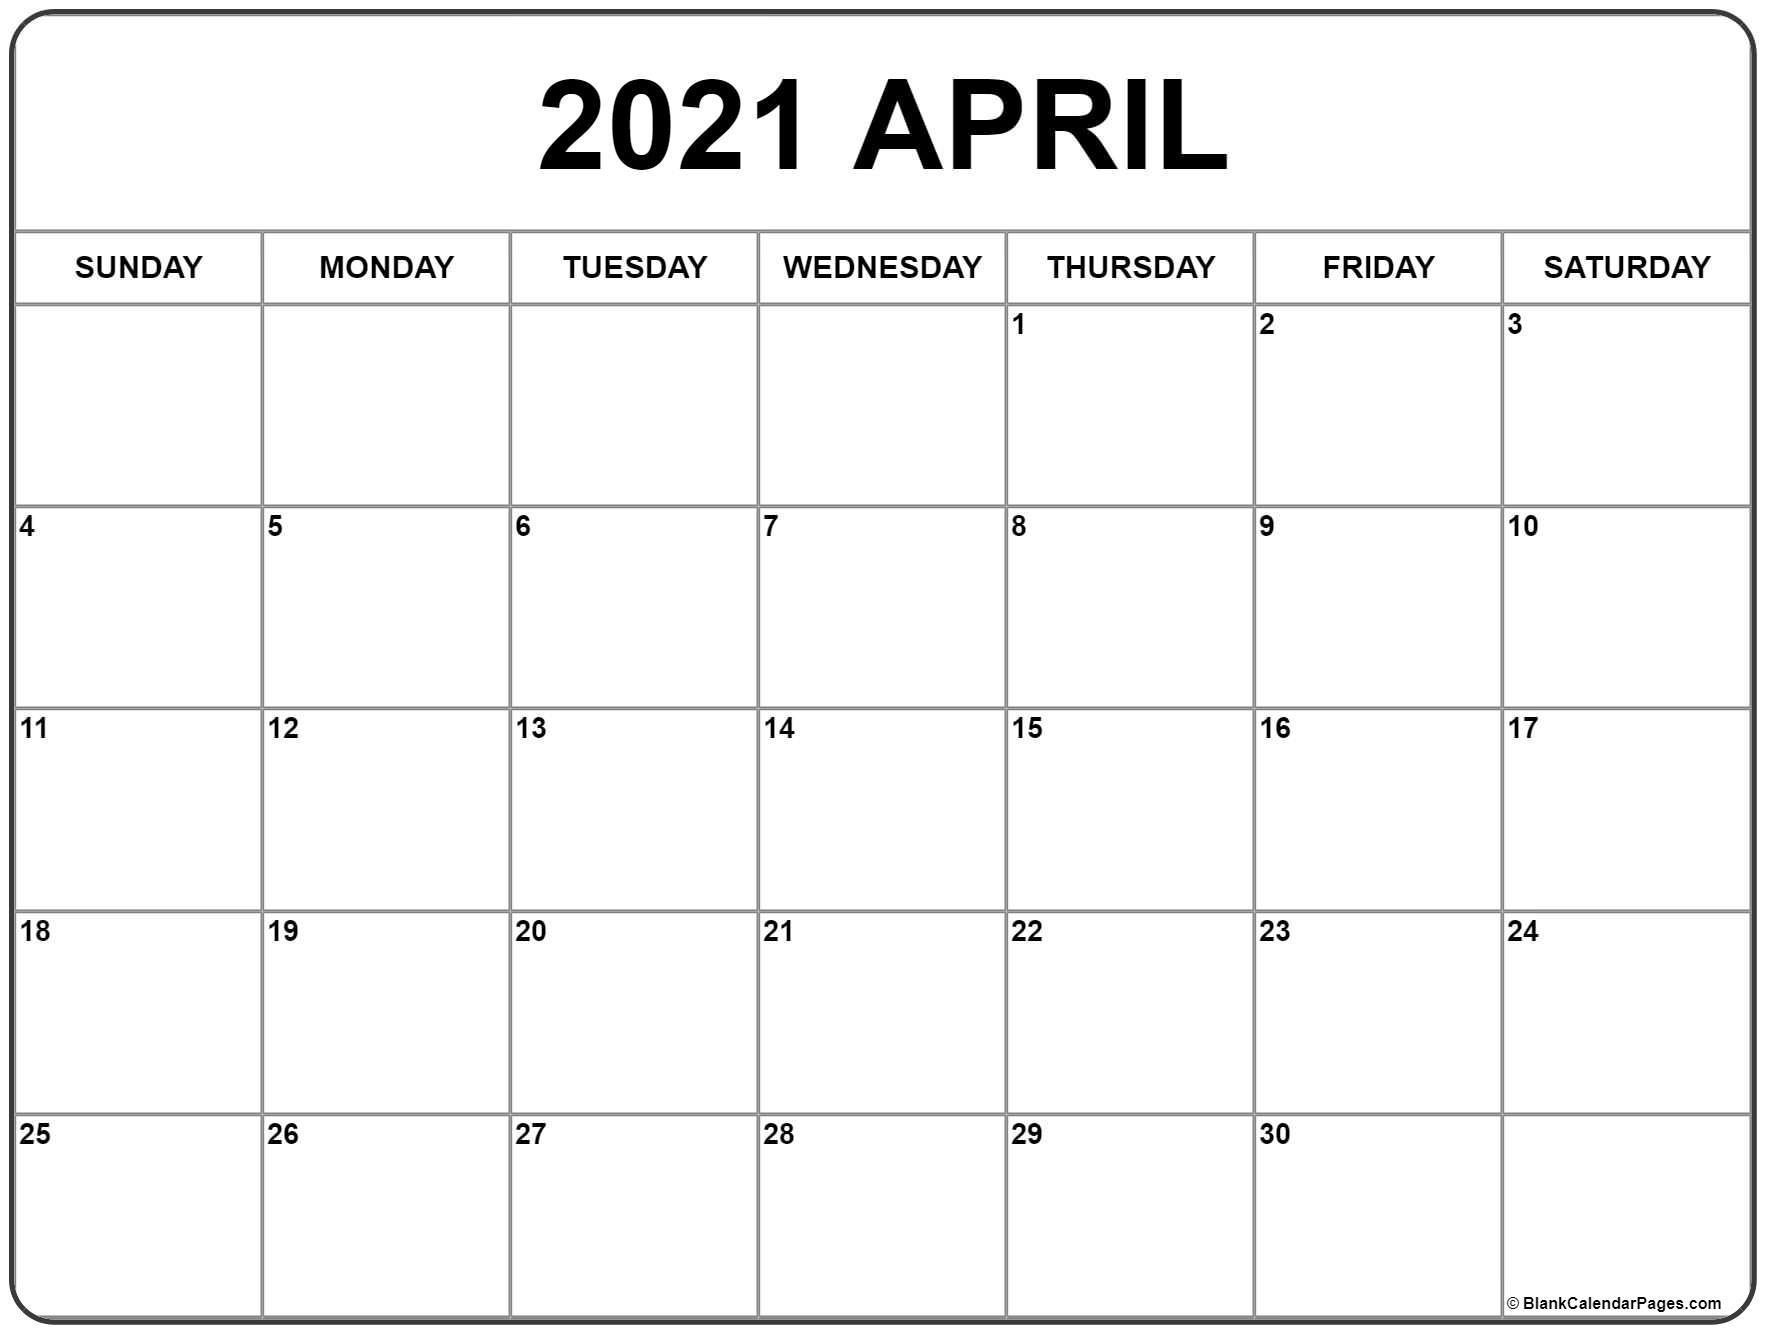 April 2021 Calendar | Free Printable Monthly Calendars  Free Calendar 2021, 2021